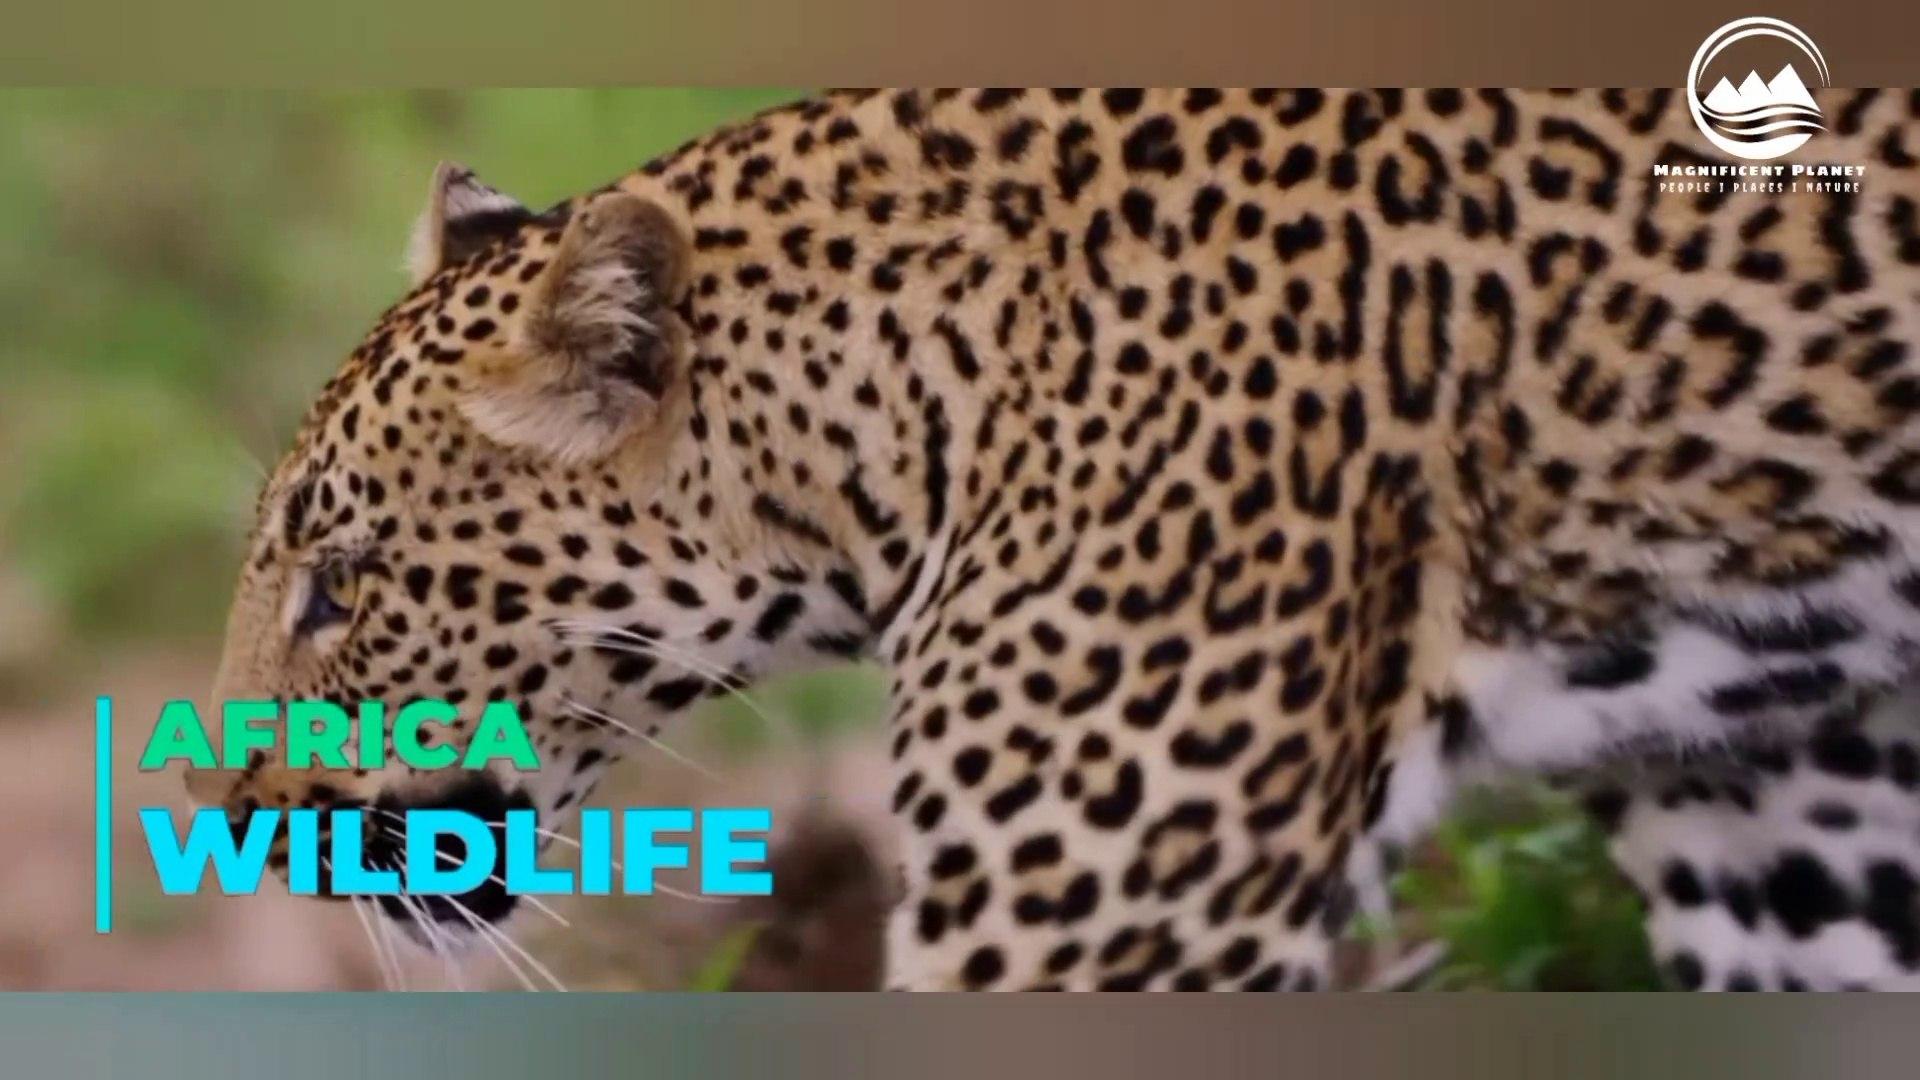 Africa- wildlife